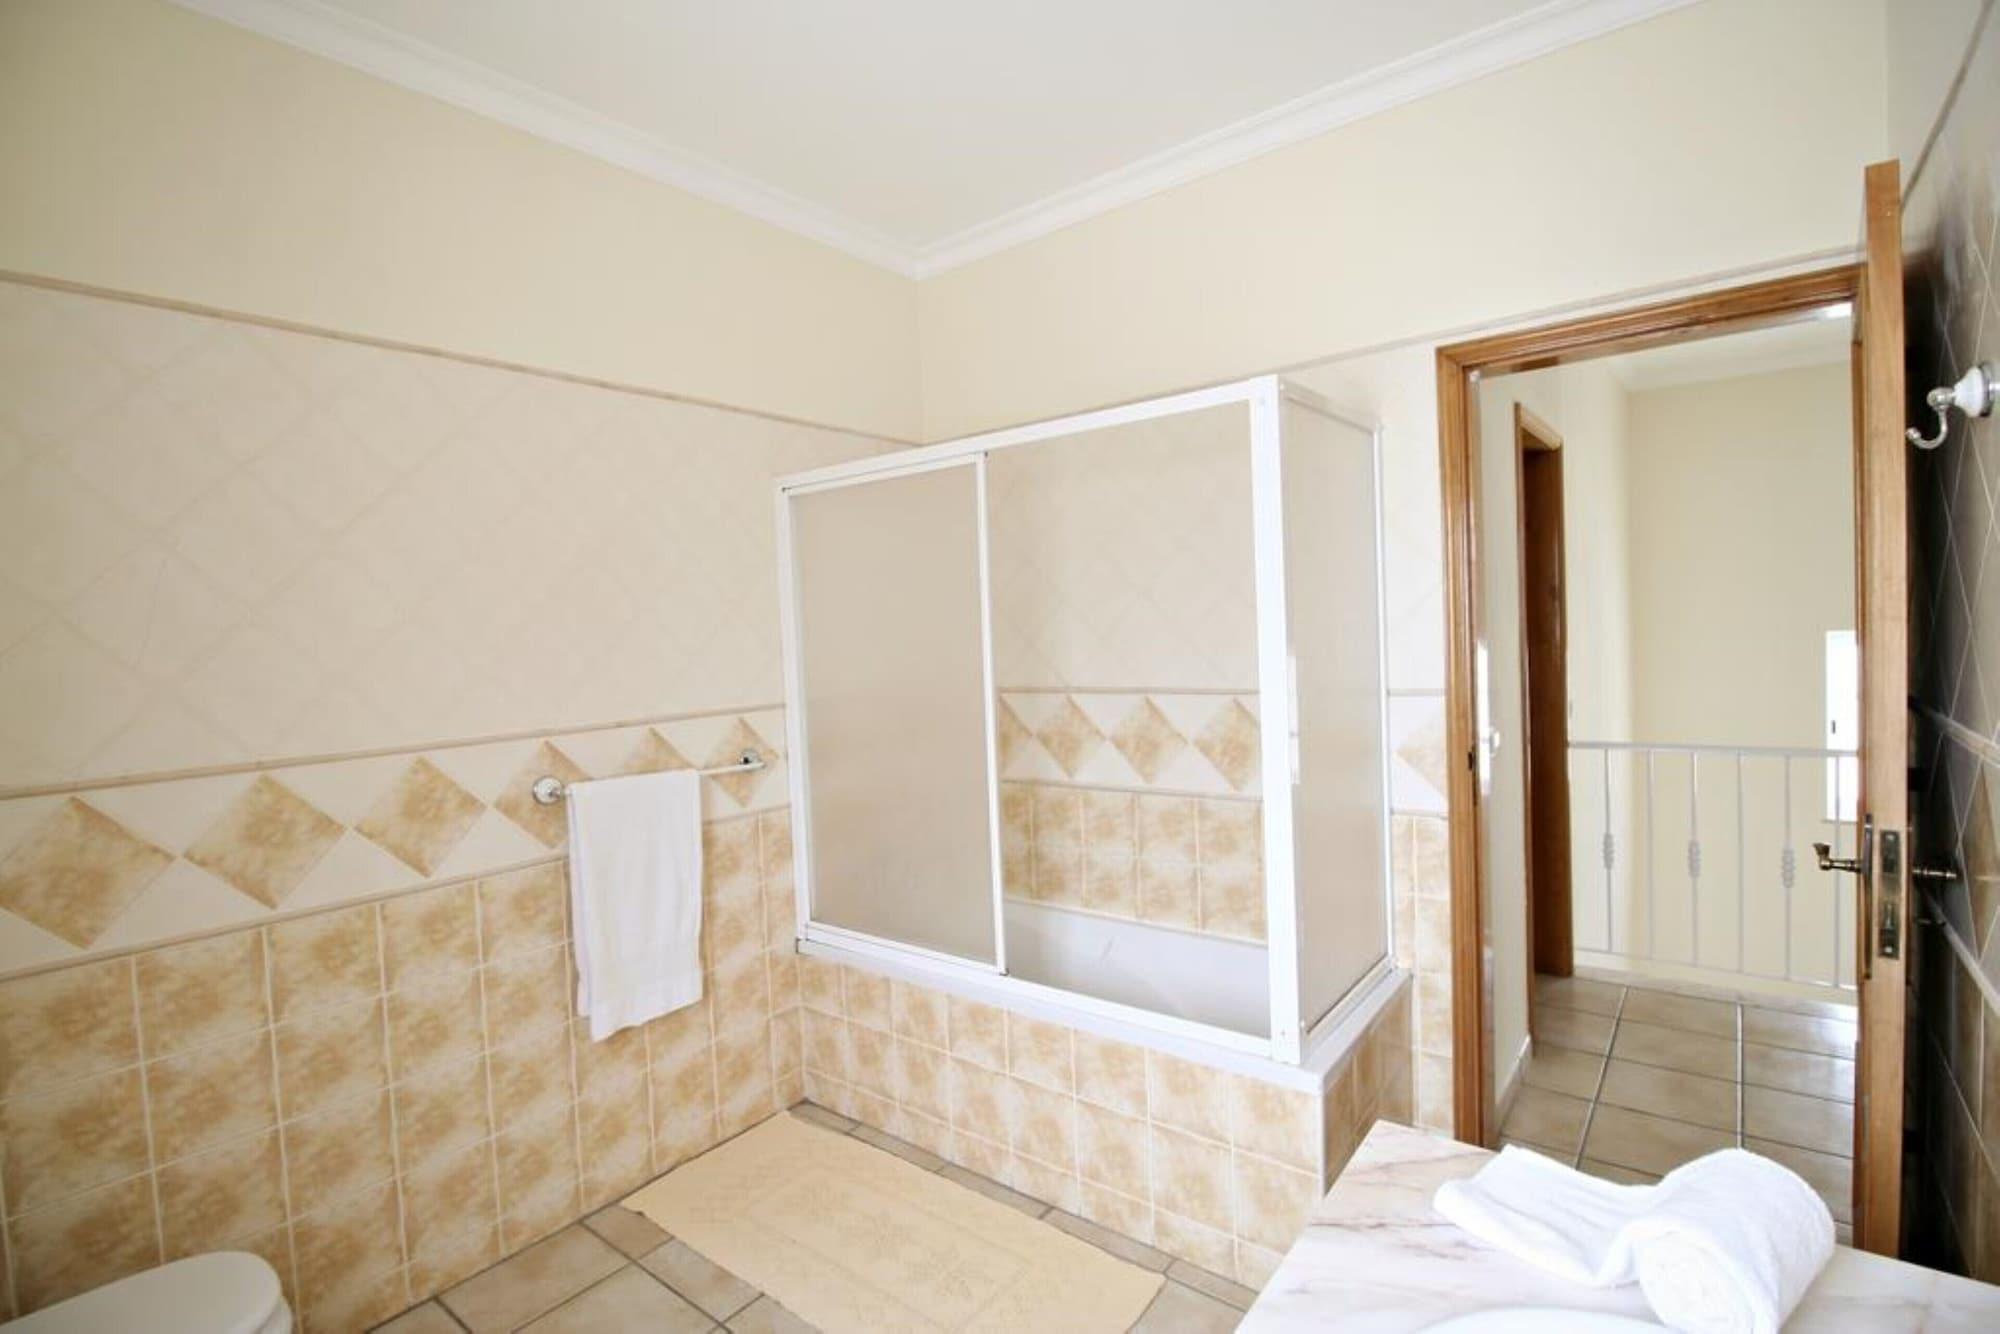 Villa - 3 Bedrooms with Pool - 101343, Albufeira